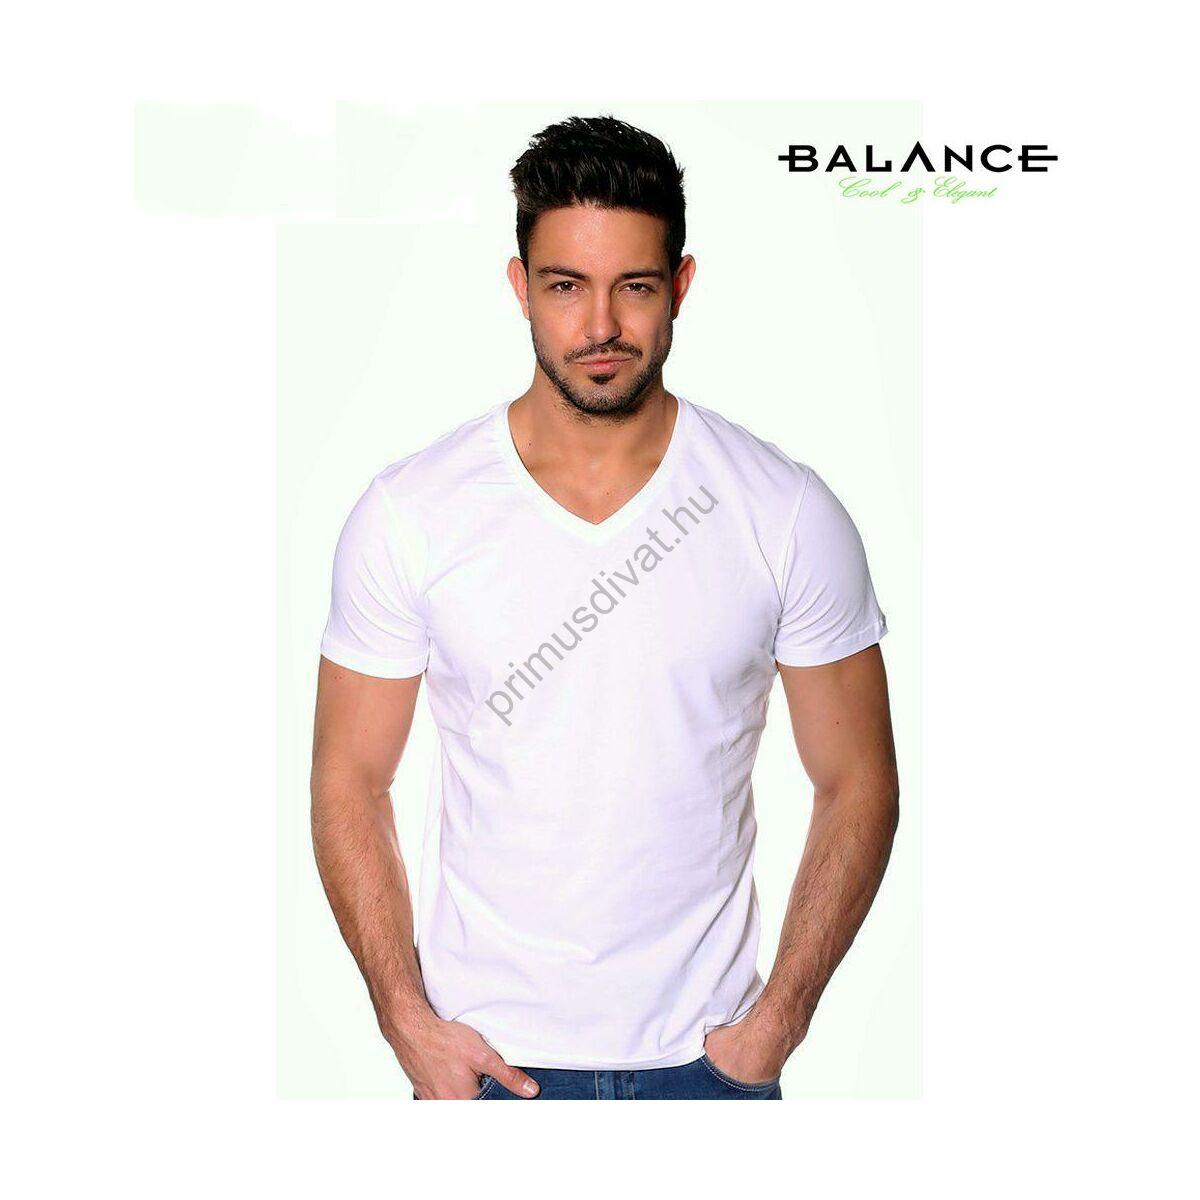 Balance V-nyakú rugalmas anyagú fehér rövid ujjú póló b374f4a07a